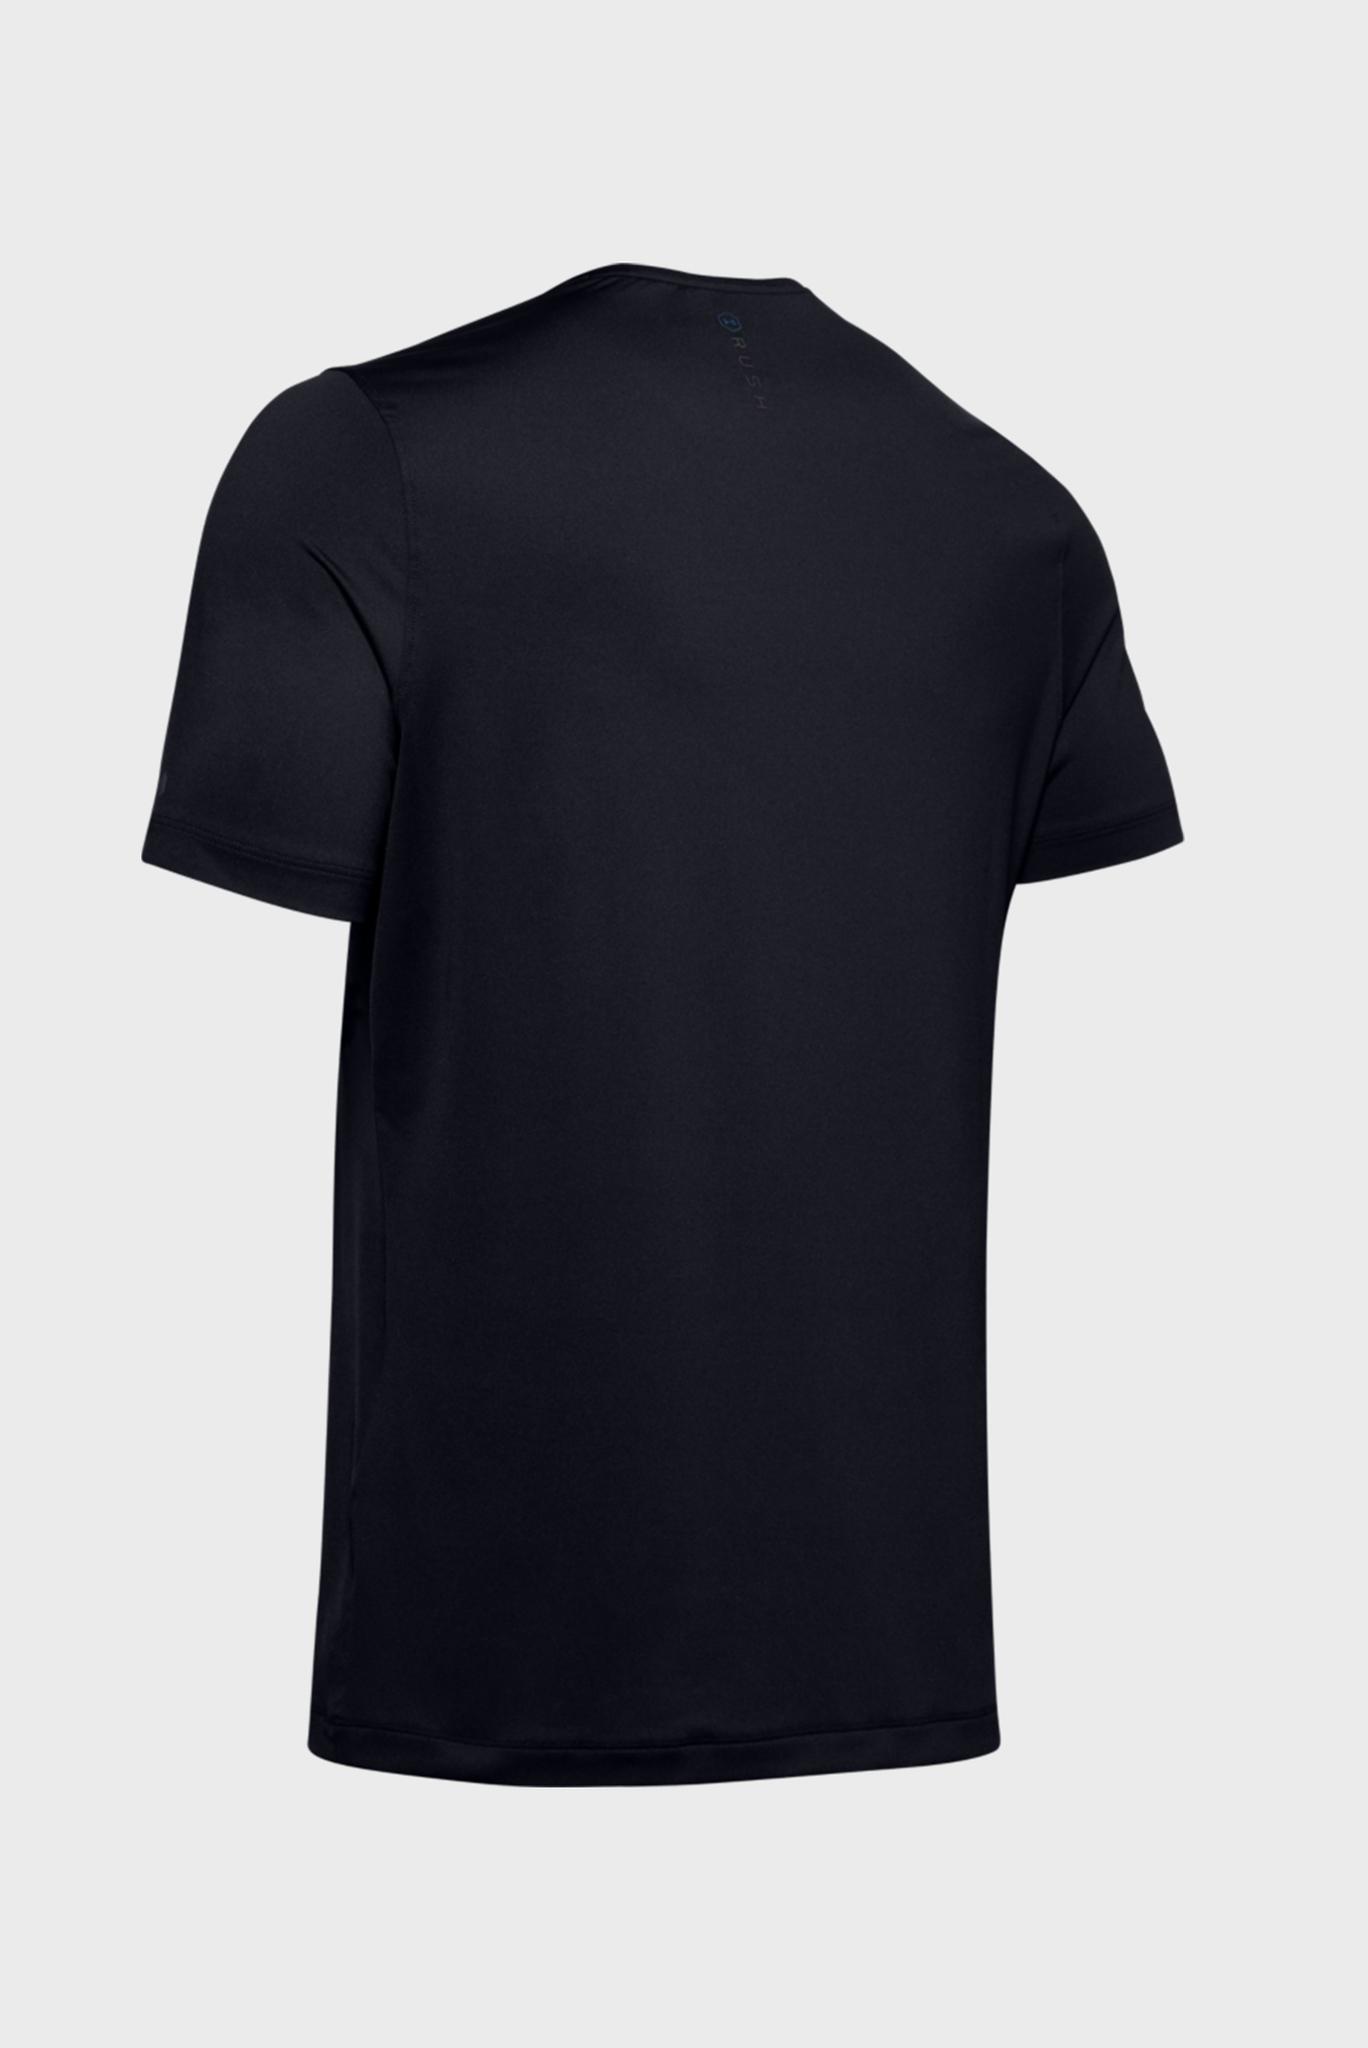 Мужская черная футболка UA HG Rush Fitted SS Under Armour